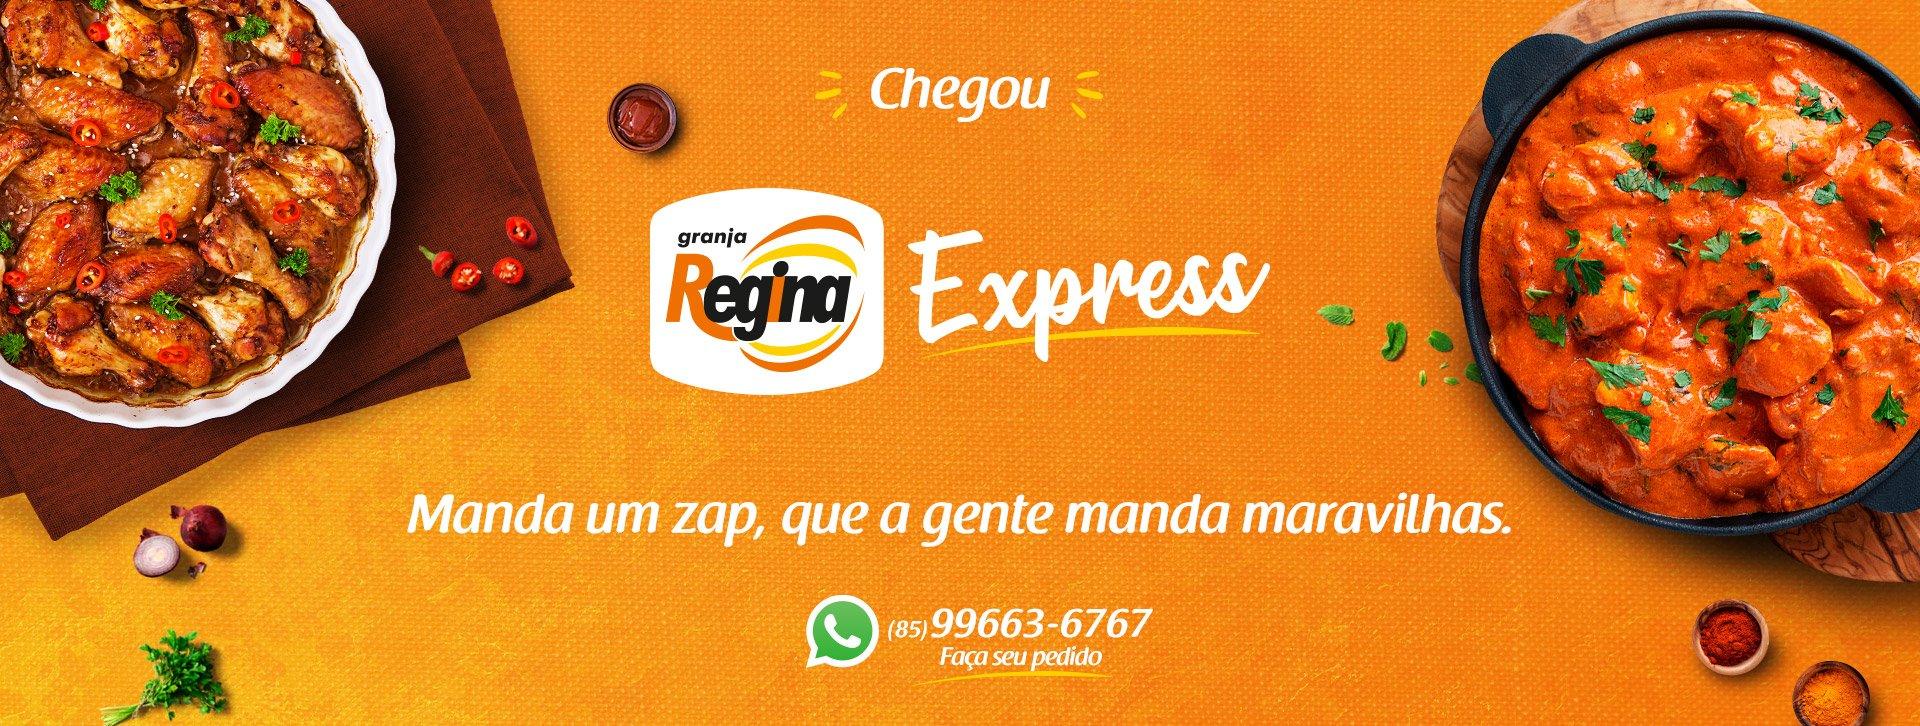 Granja Regina Express